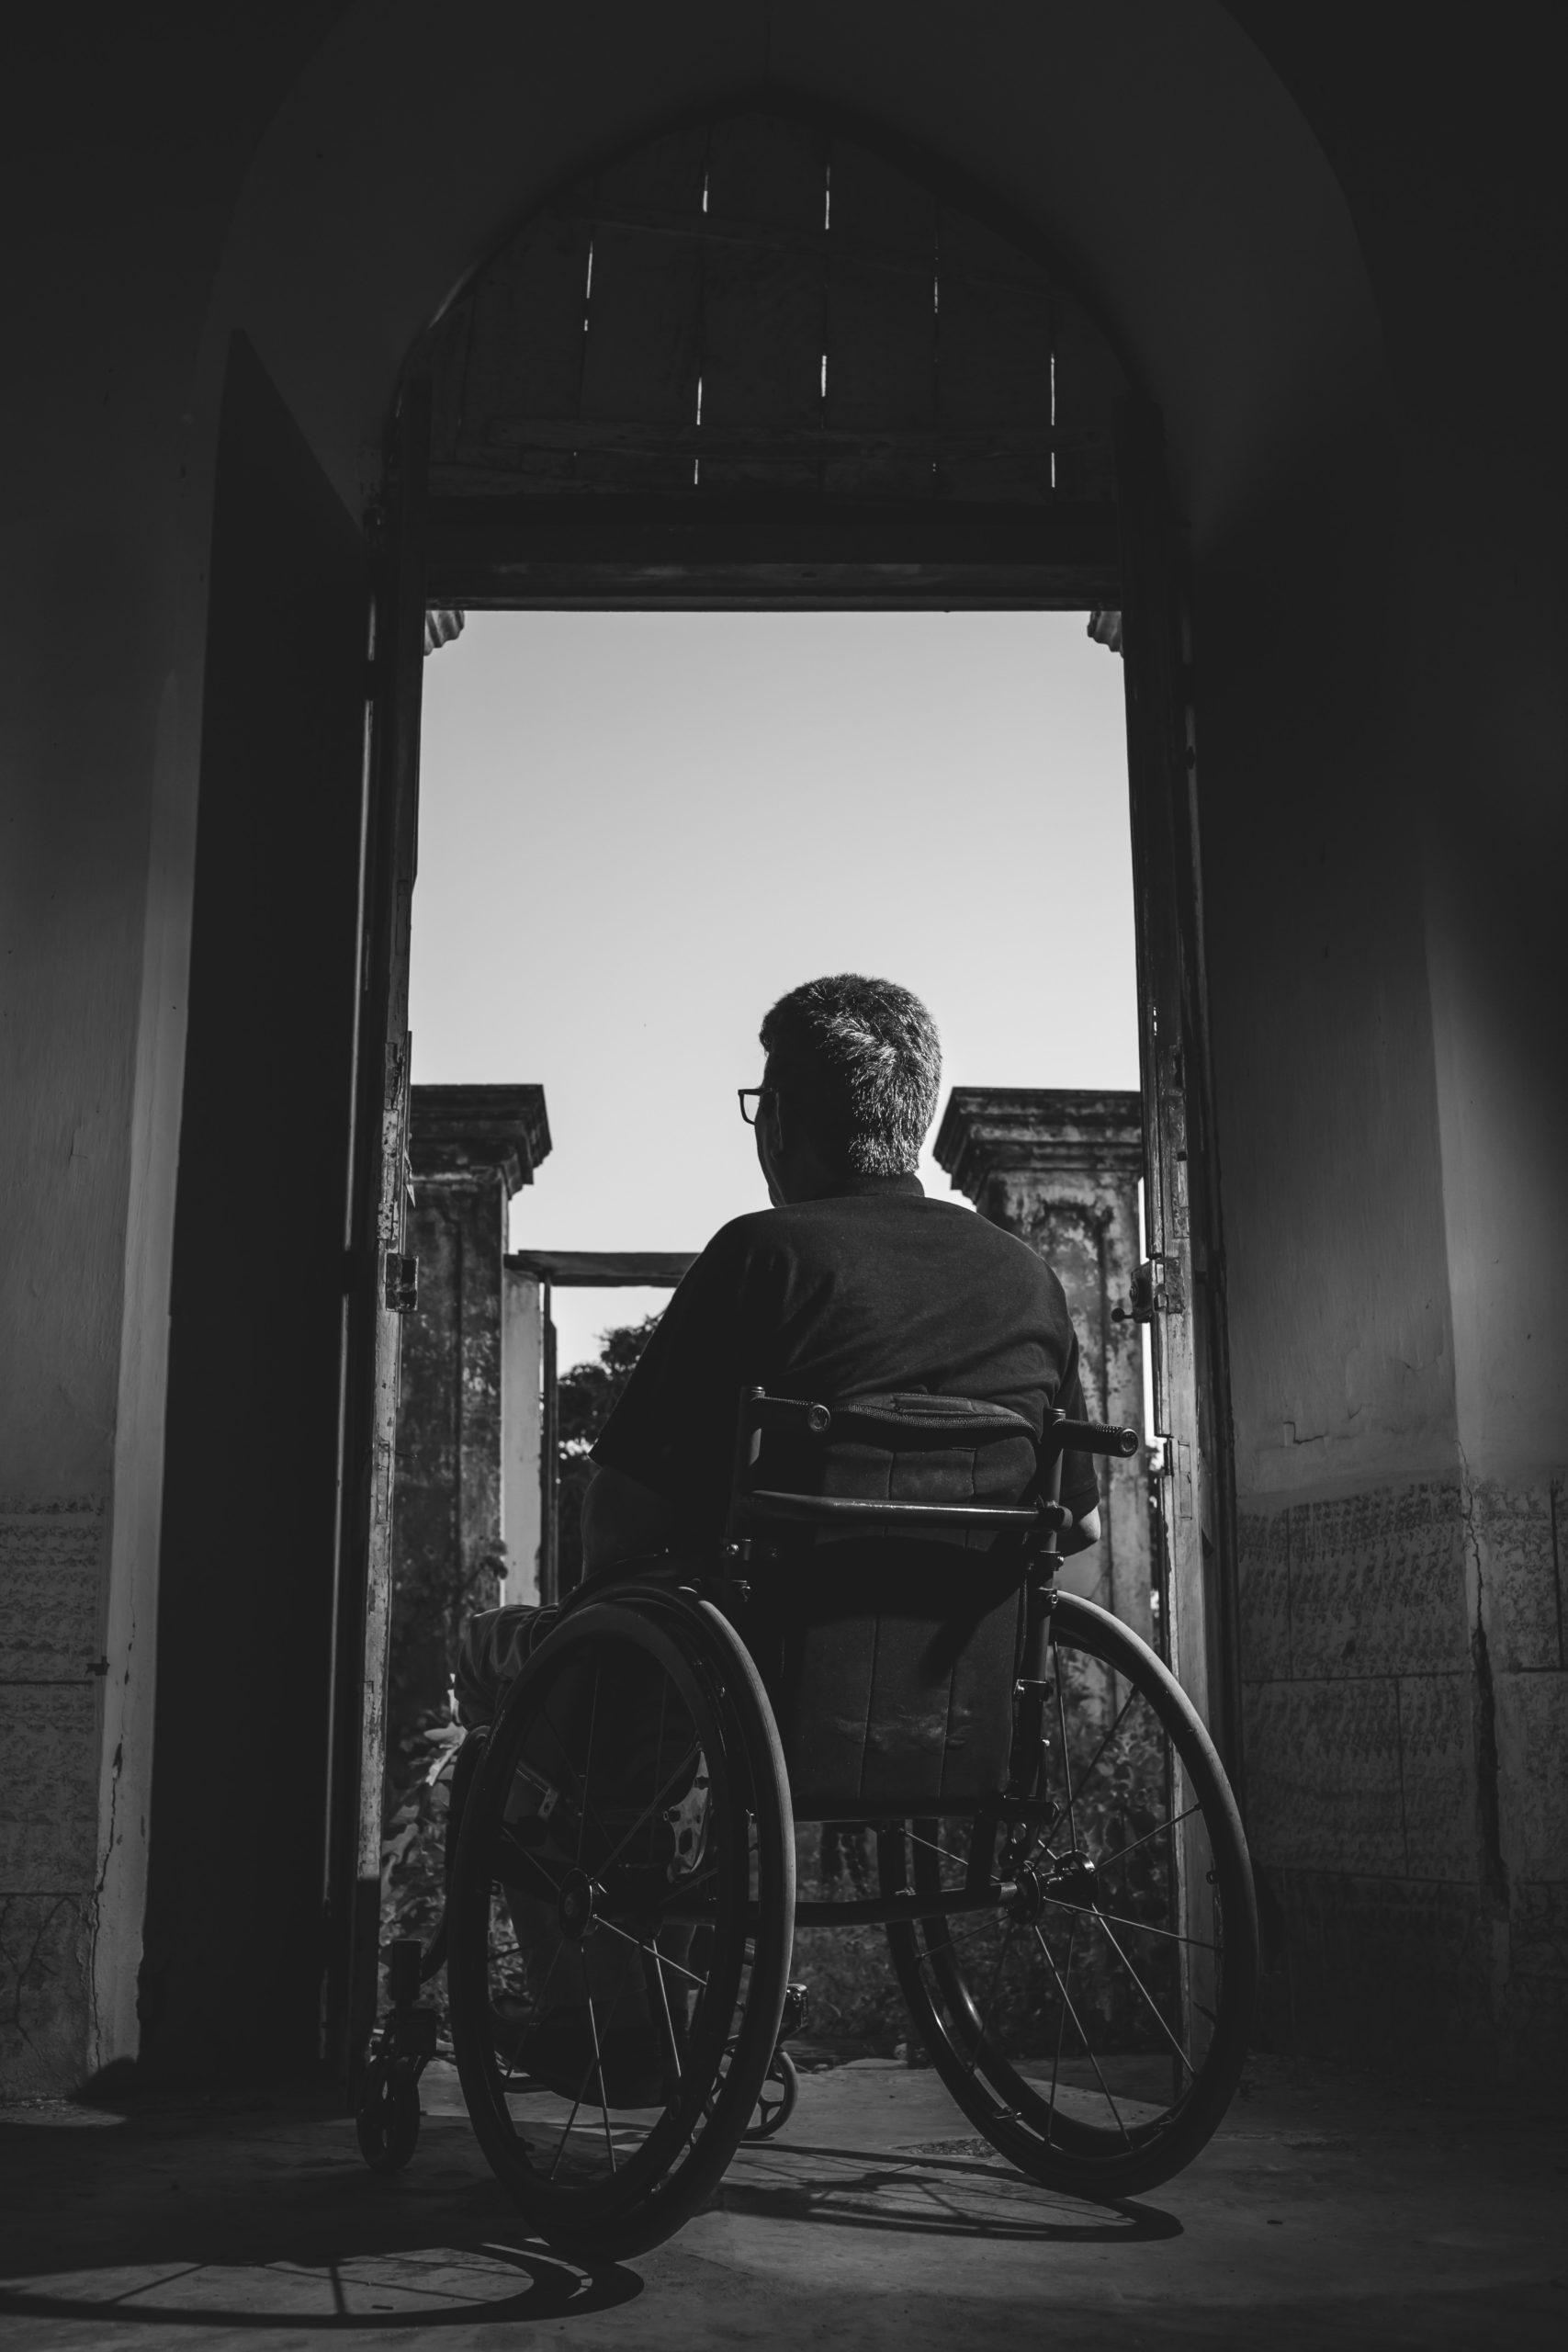 grayscale photography of man sitting on wheelchair 3044623 scaled - الأمراض و السفر: التعامل مع الحالات المرضية في السفر